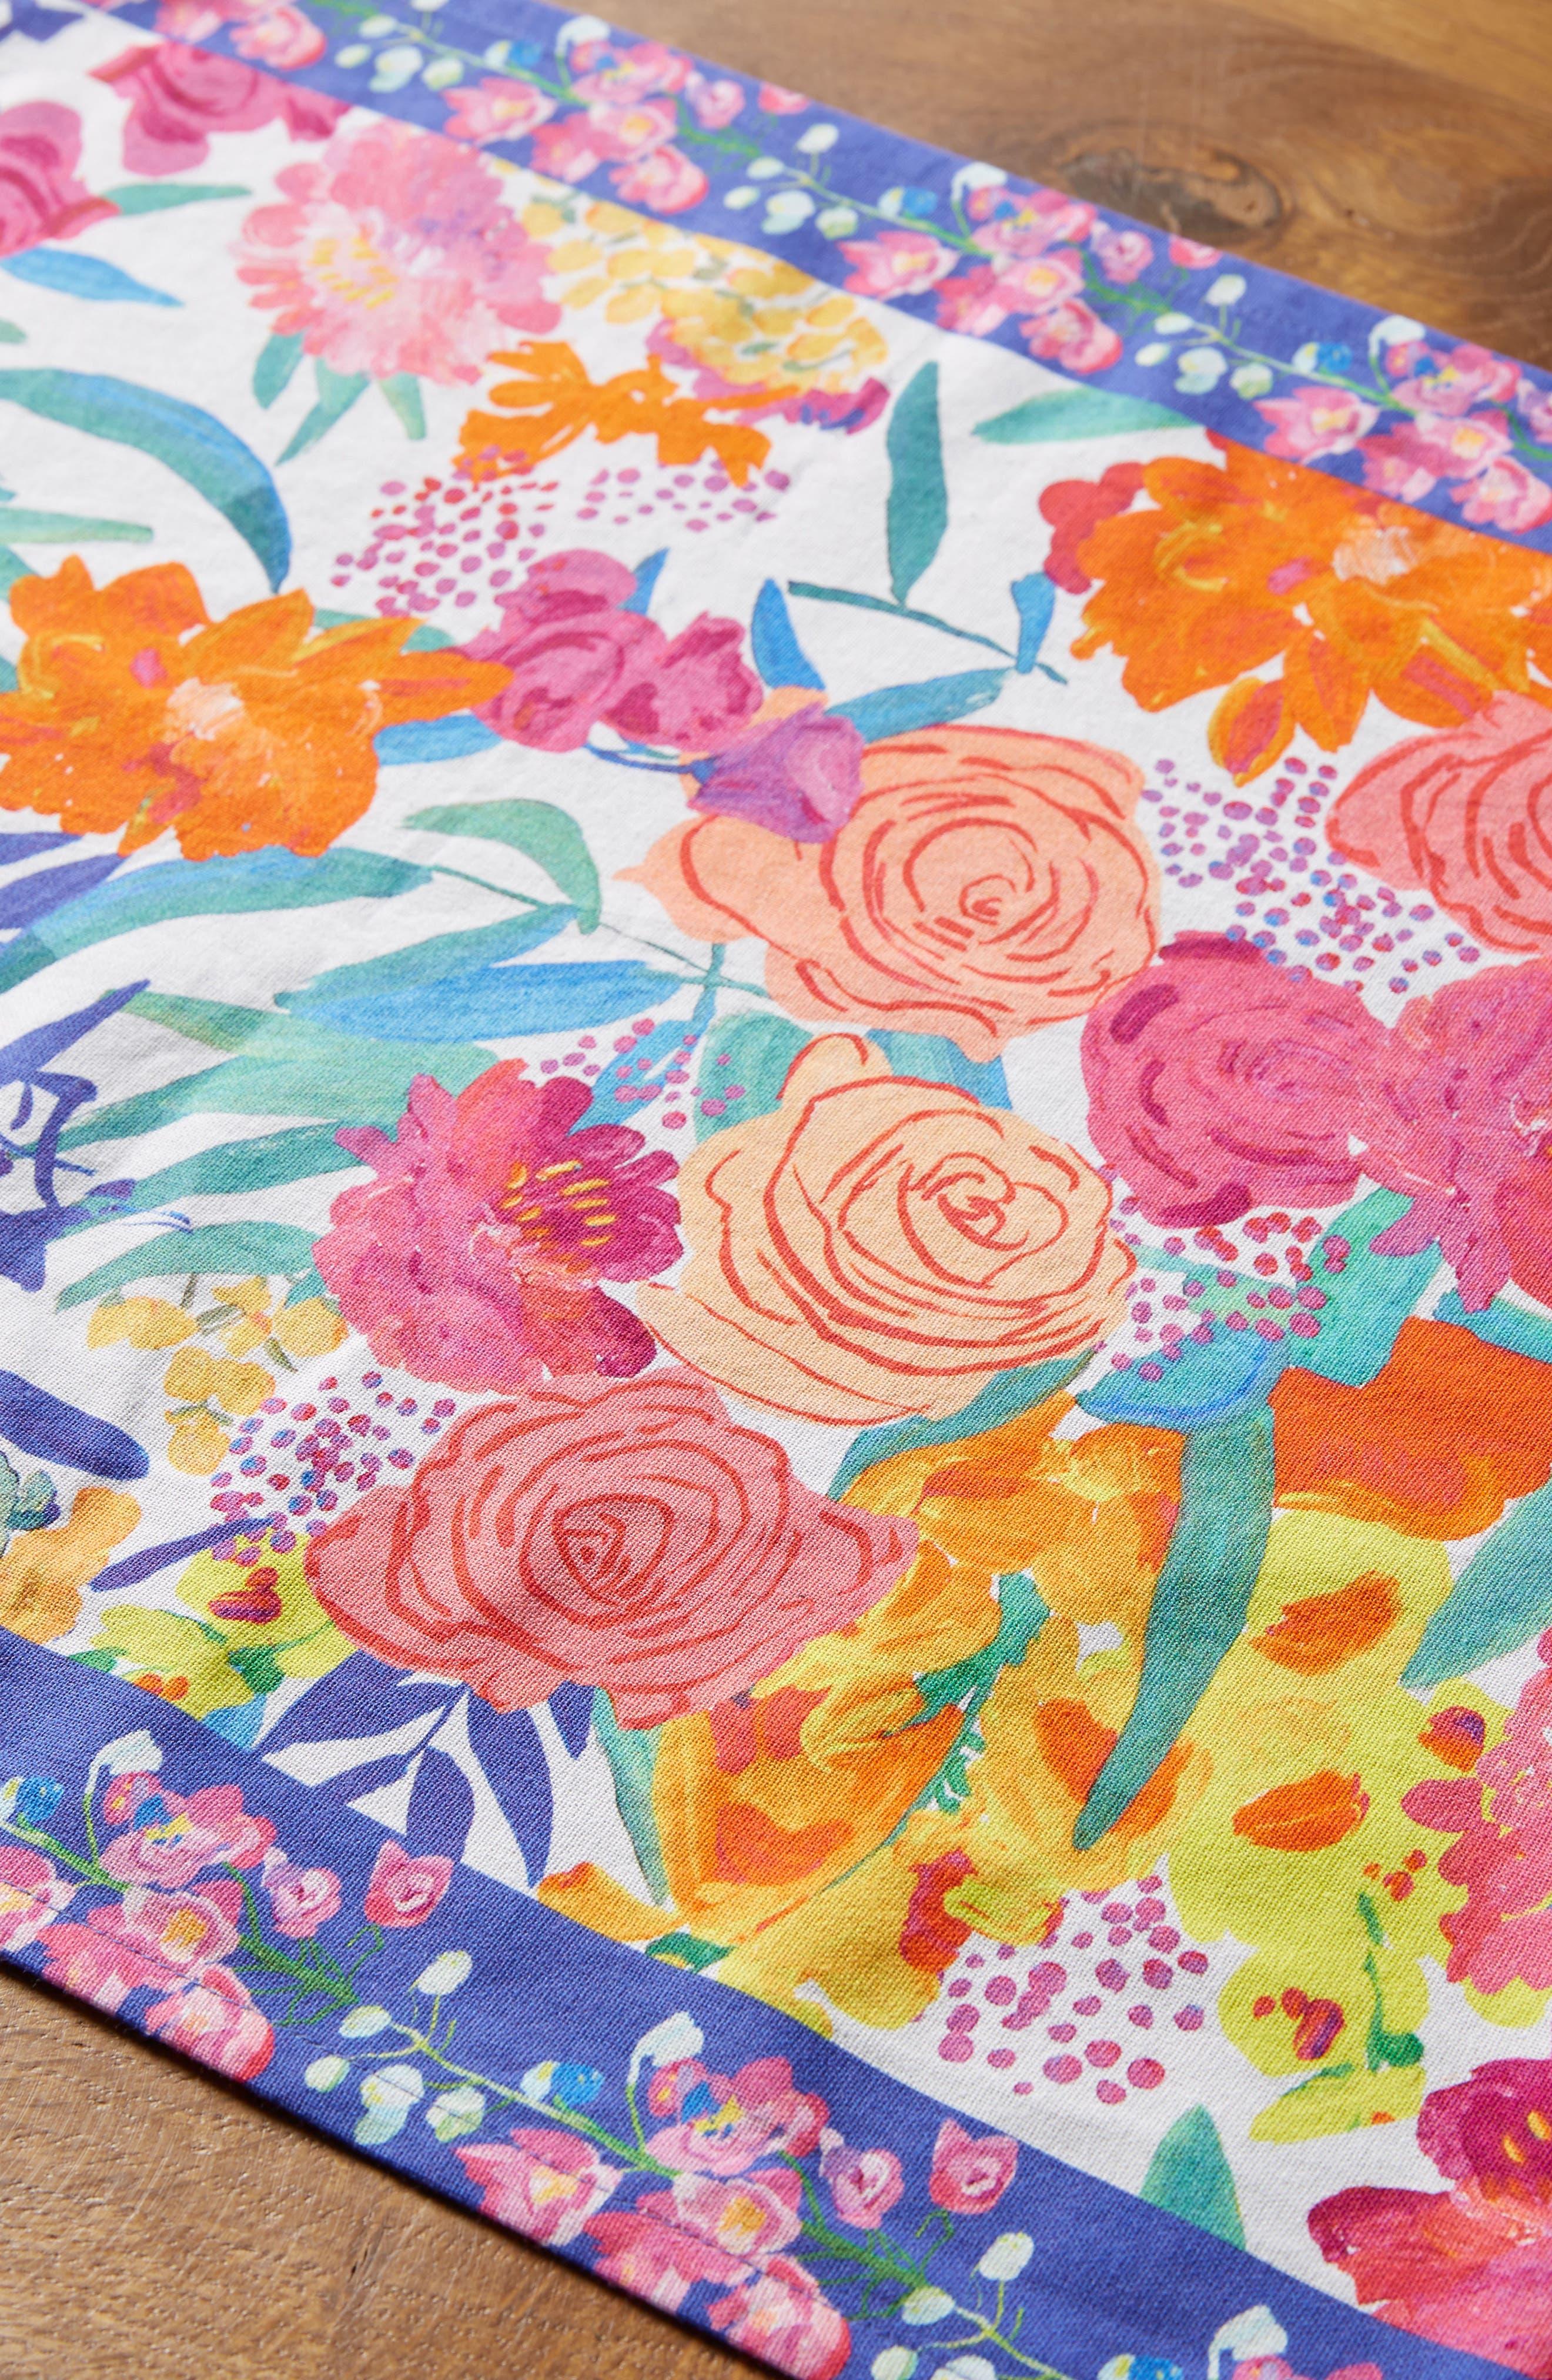 Paint + Petals Table Runner,                             Alternate thumbnail 2, color,                             100